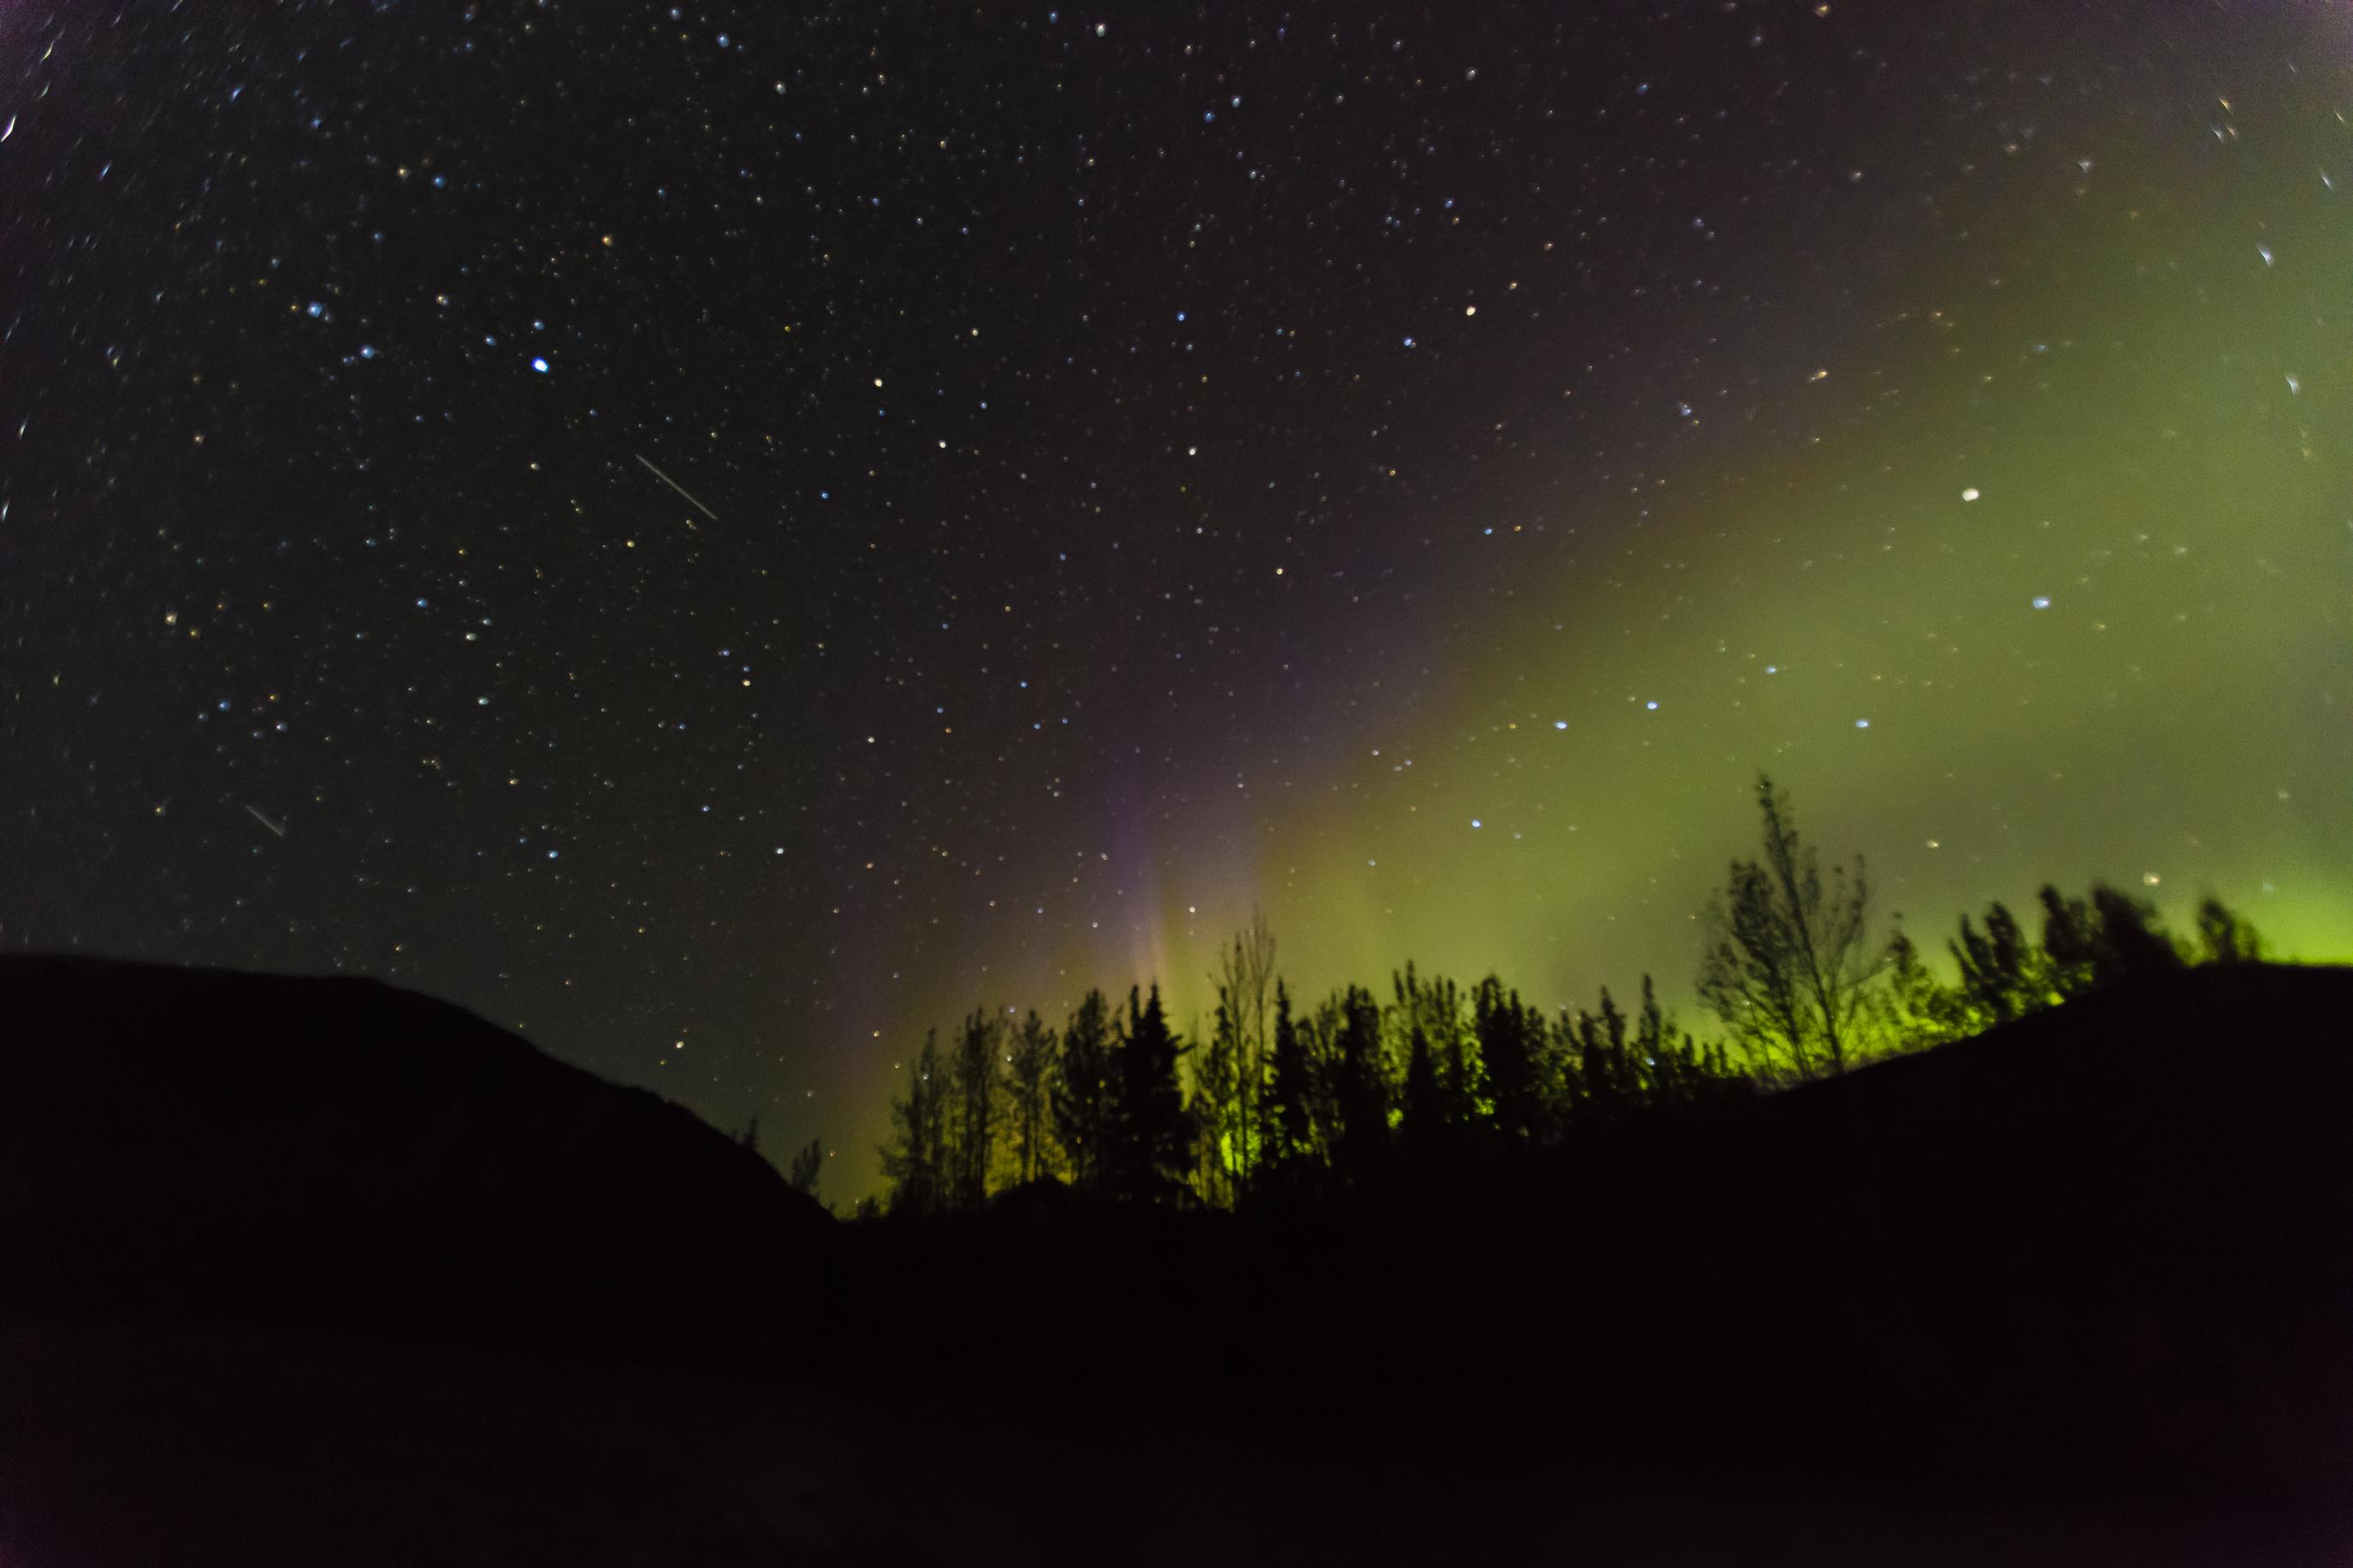 aurora-borealis-denali-national-park.jpg?mtime=20190116211228#asset:104513